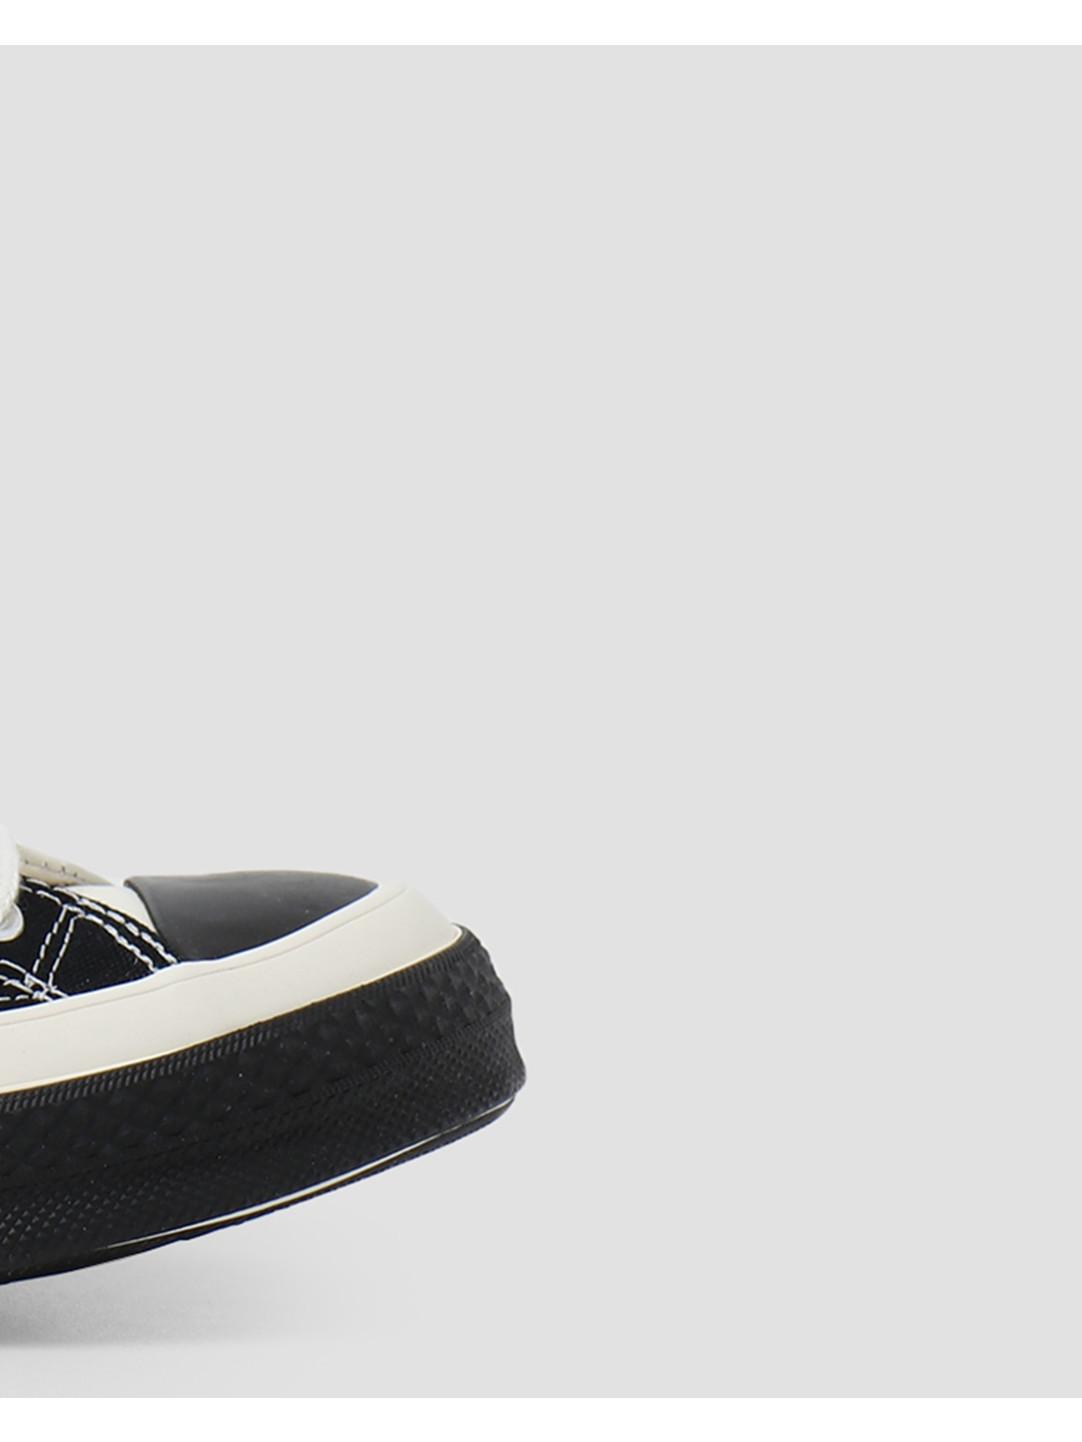 Converse Converse Chuck 70 OX Black Egret Black 168628C